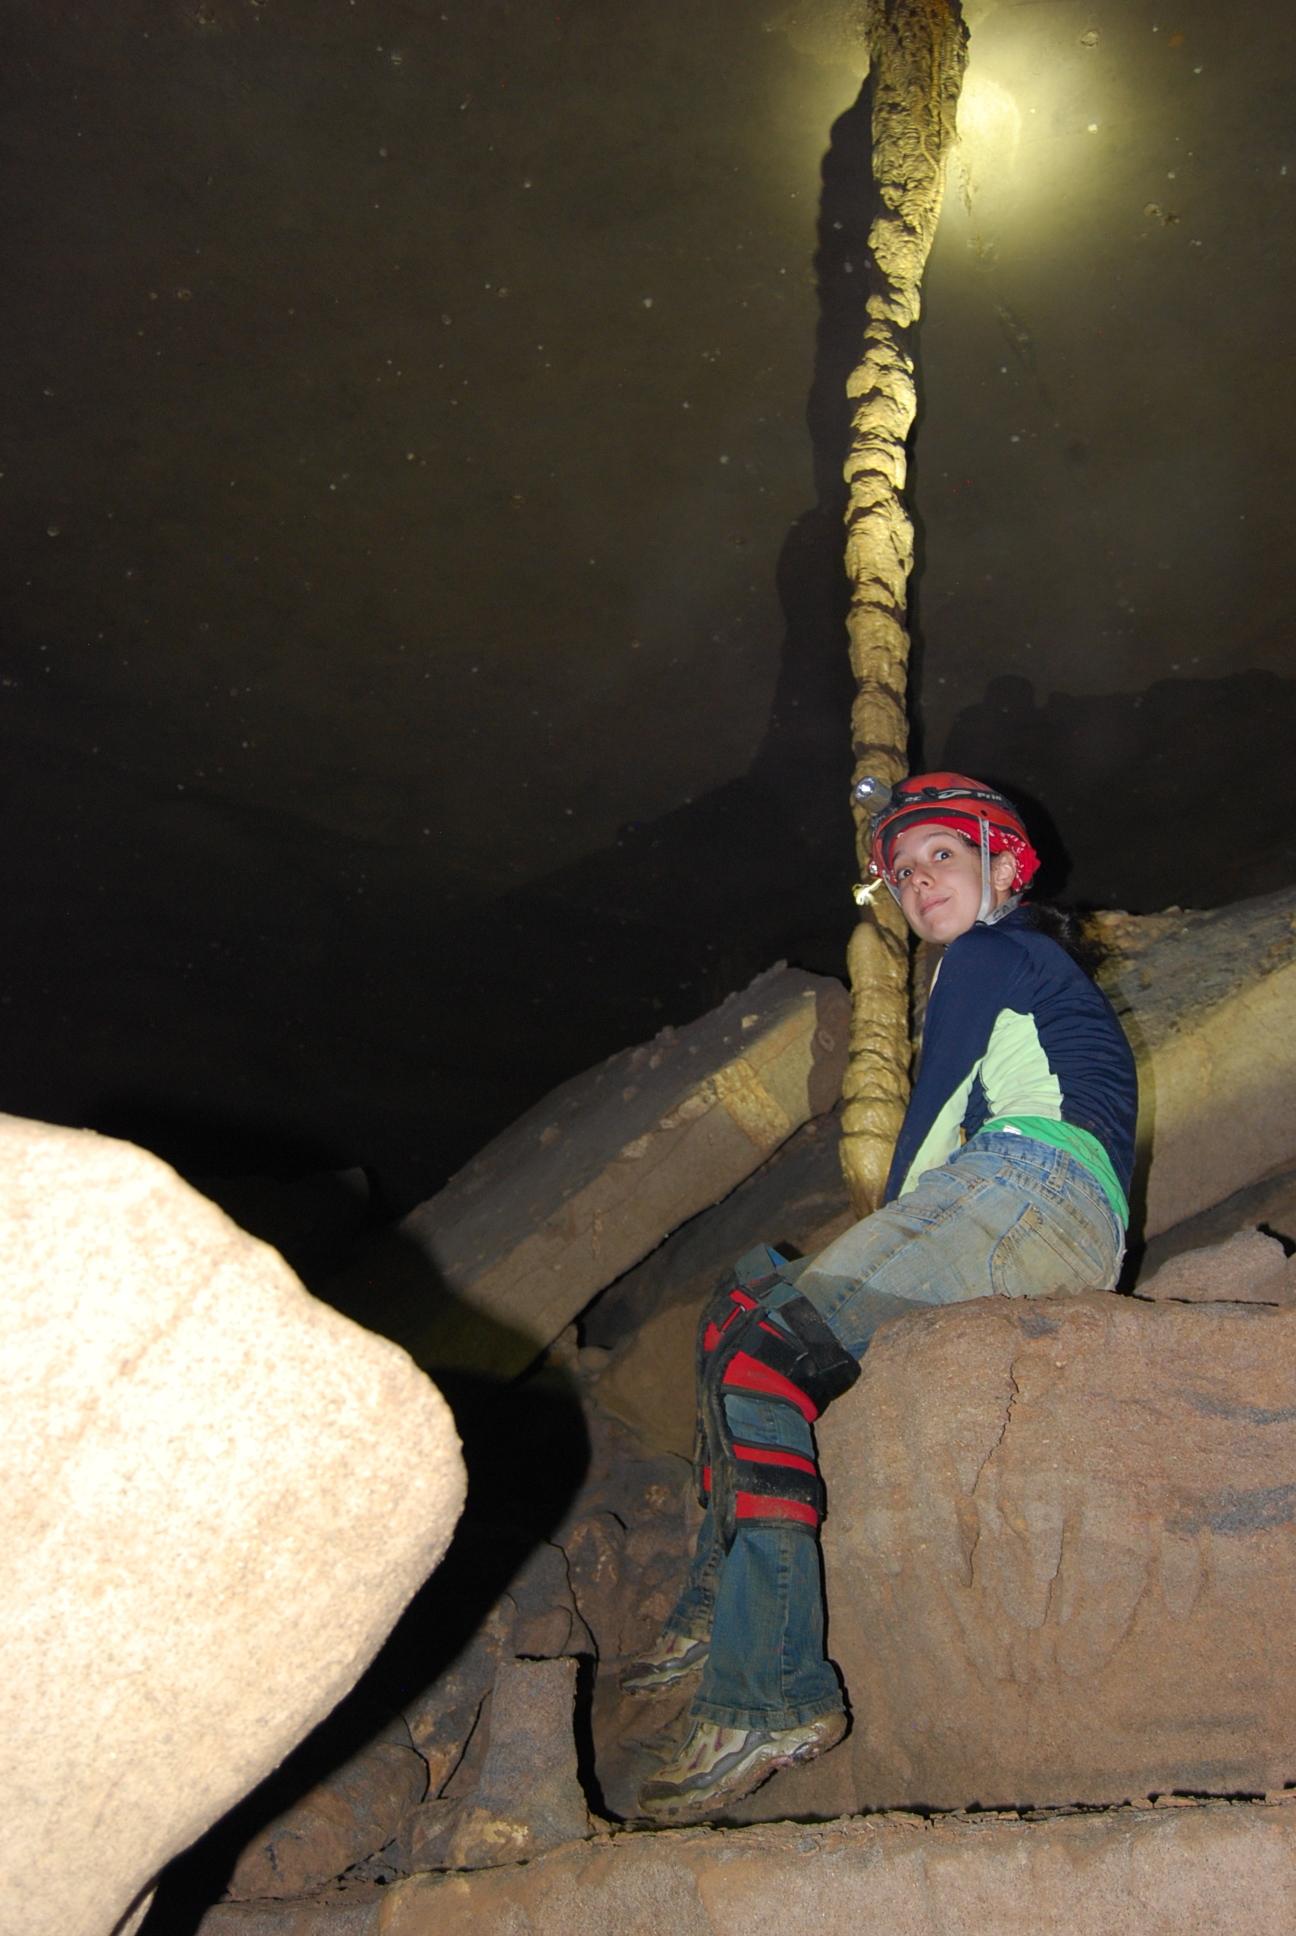 Caver enjoys a 20 foot tall column.